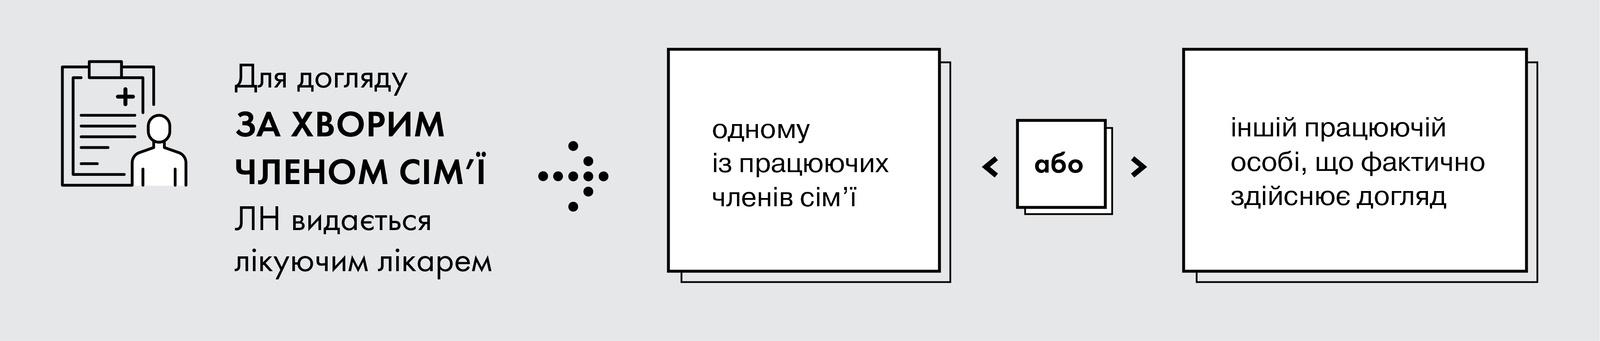 https://e.kadrovik.ua/sites/default/files/styles/popup/public/images/oZzrGx4sRYLIfzYFg3WUDwrdRXqz1wkygjc6MMV0v0RmvMHRv5.jpg?itok=2o0su9hn